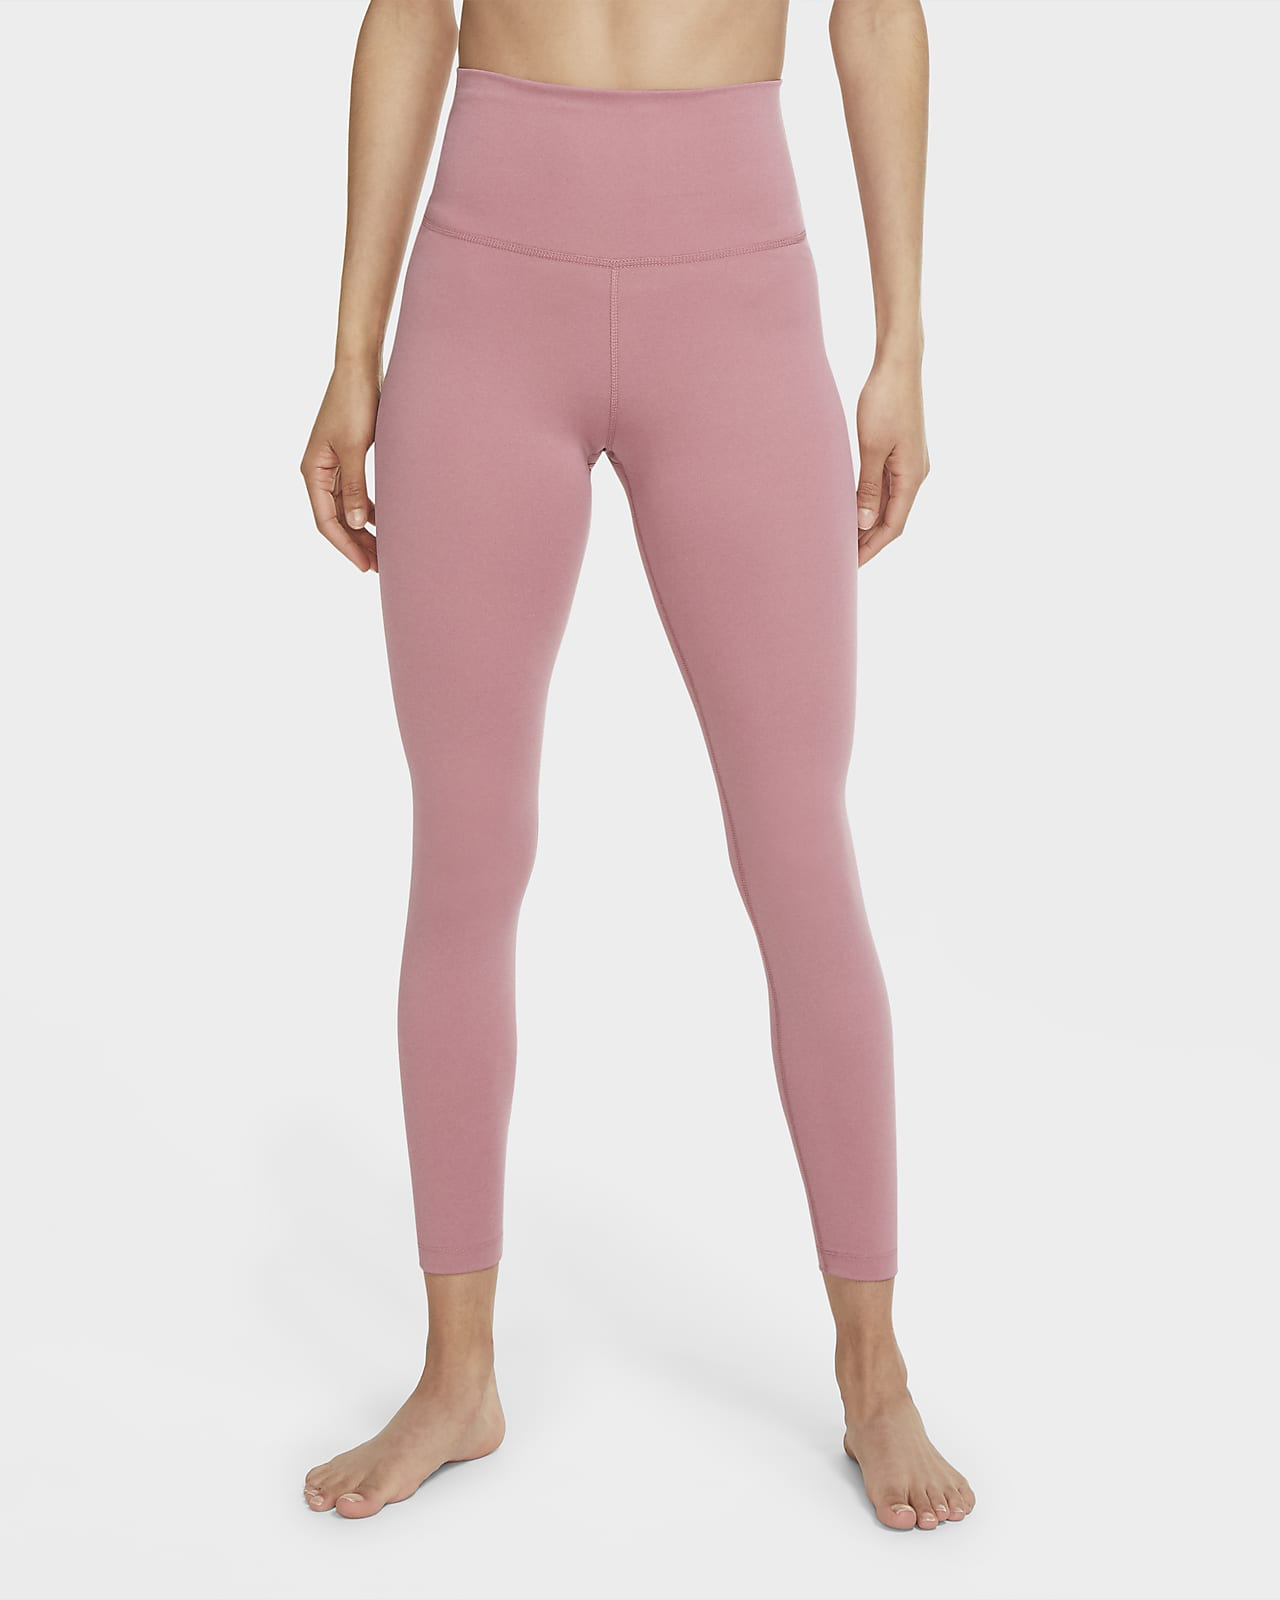 Nike Yoga 7/8-tights voor dames